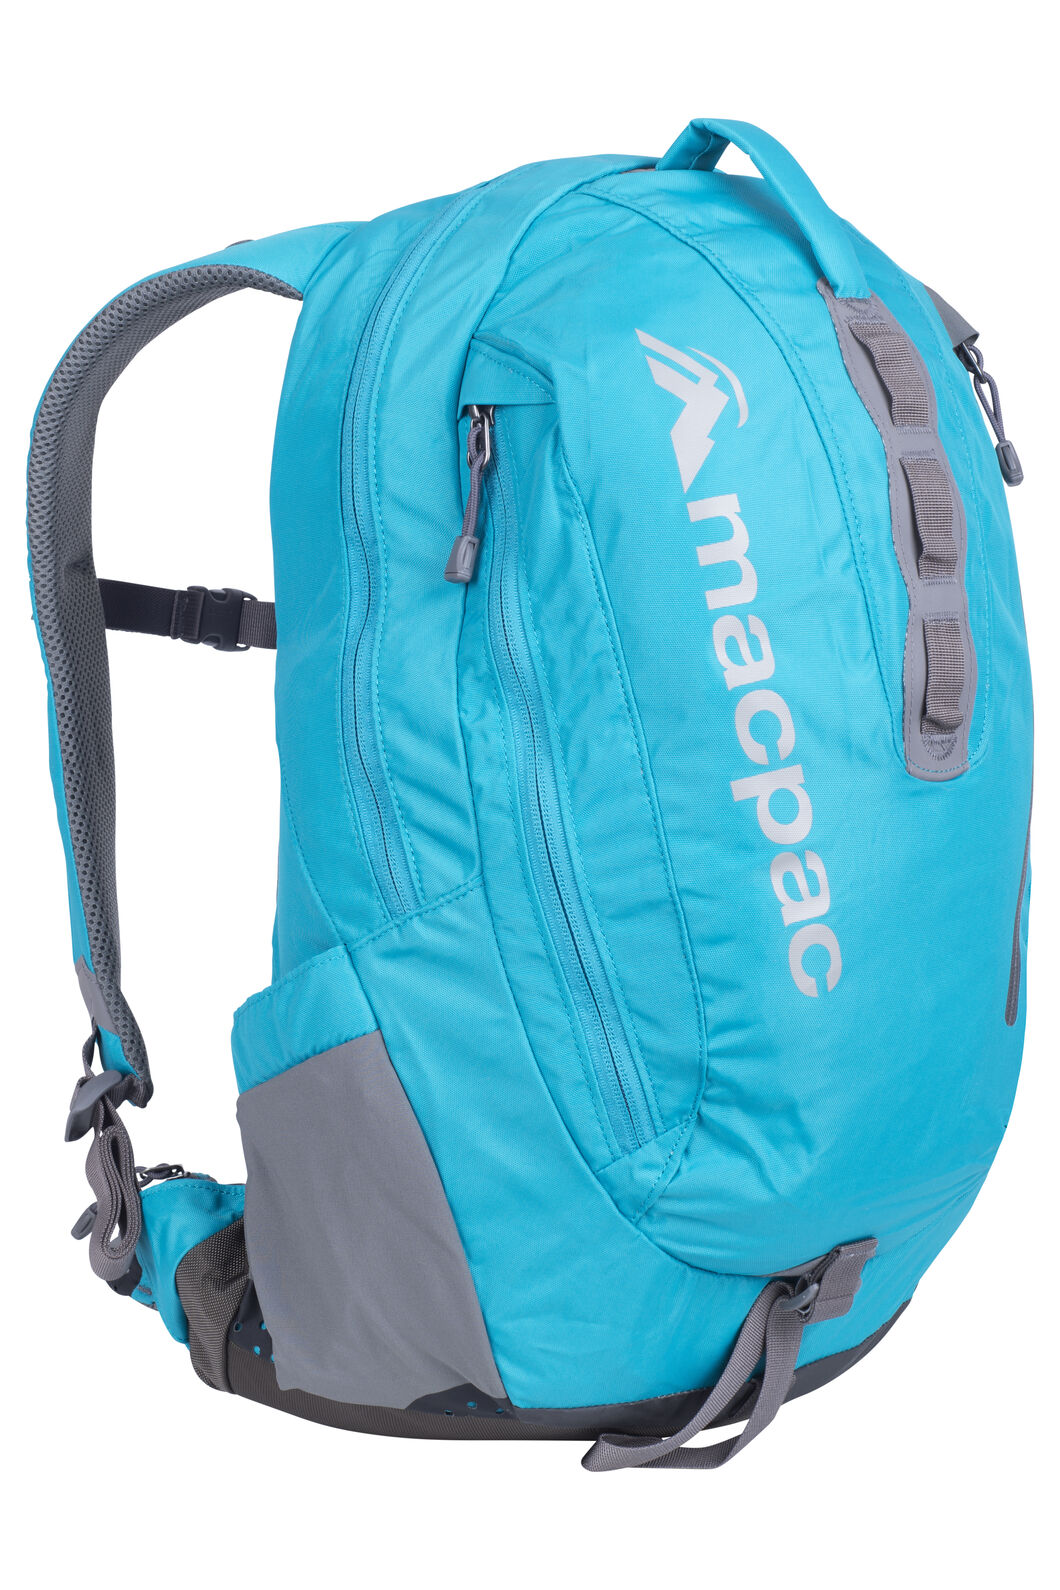 Rapaki 26L Daypack, Enamel Blue, hi-res